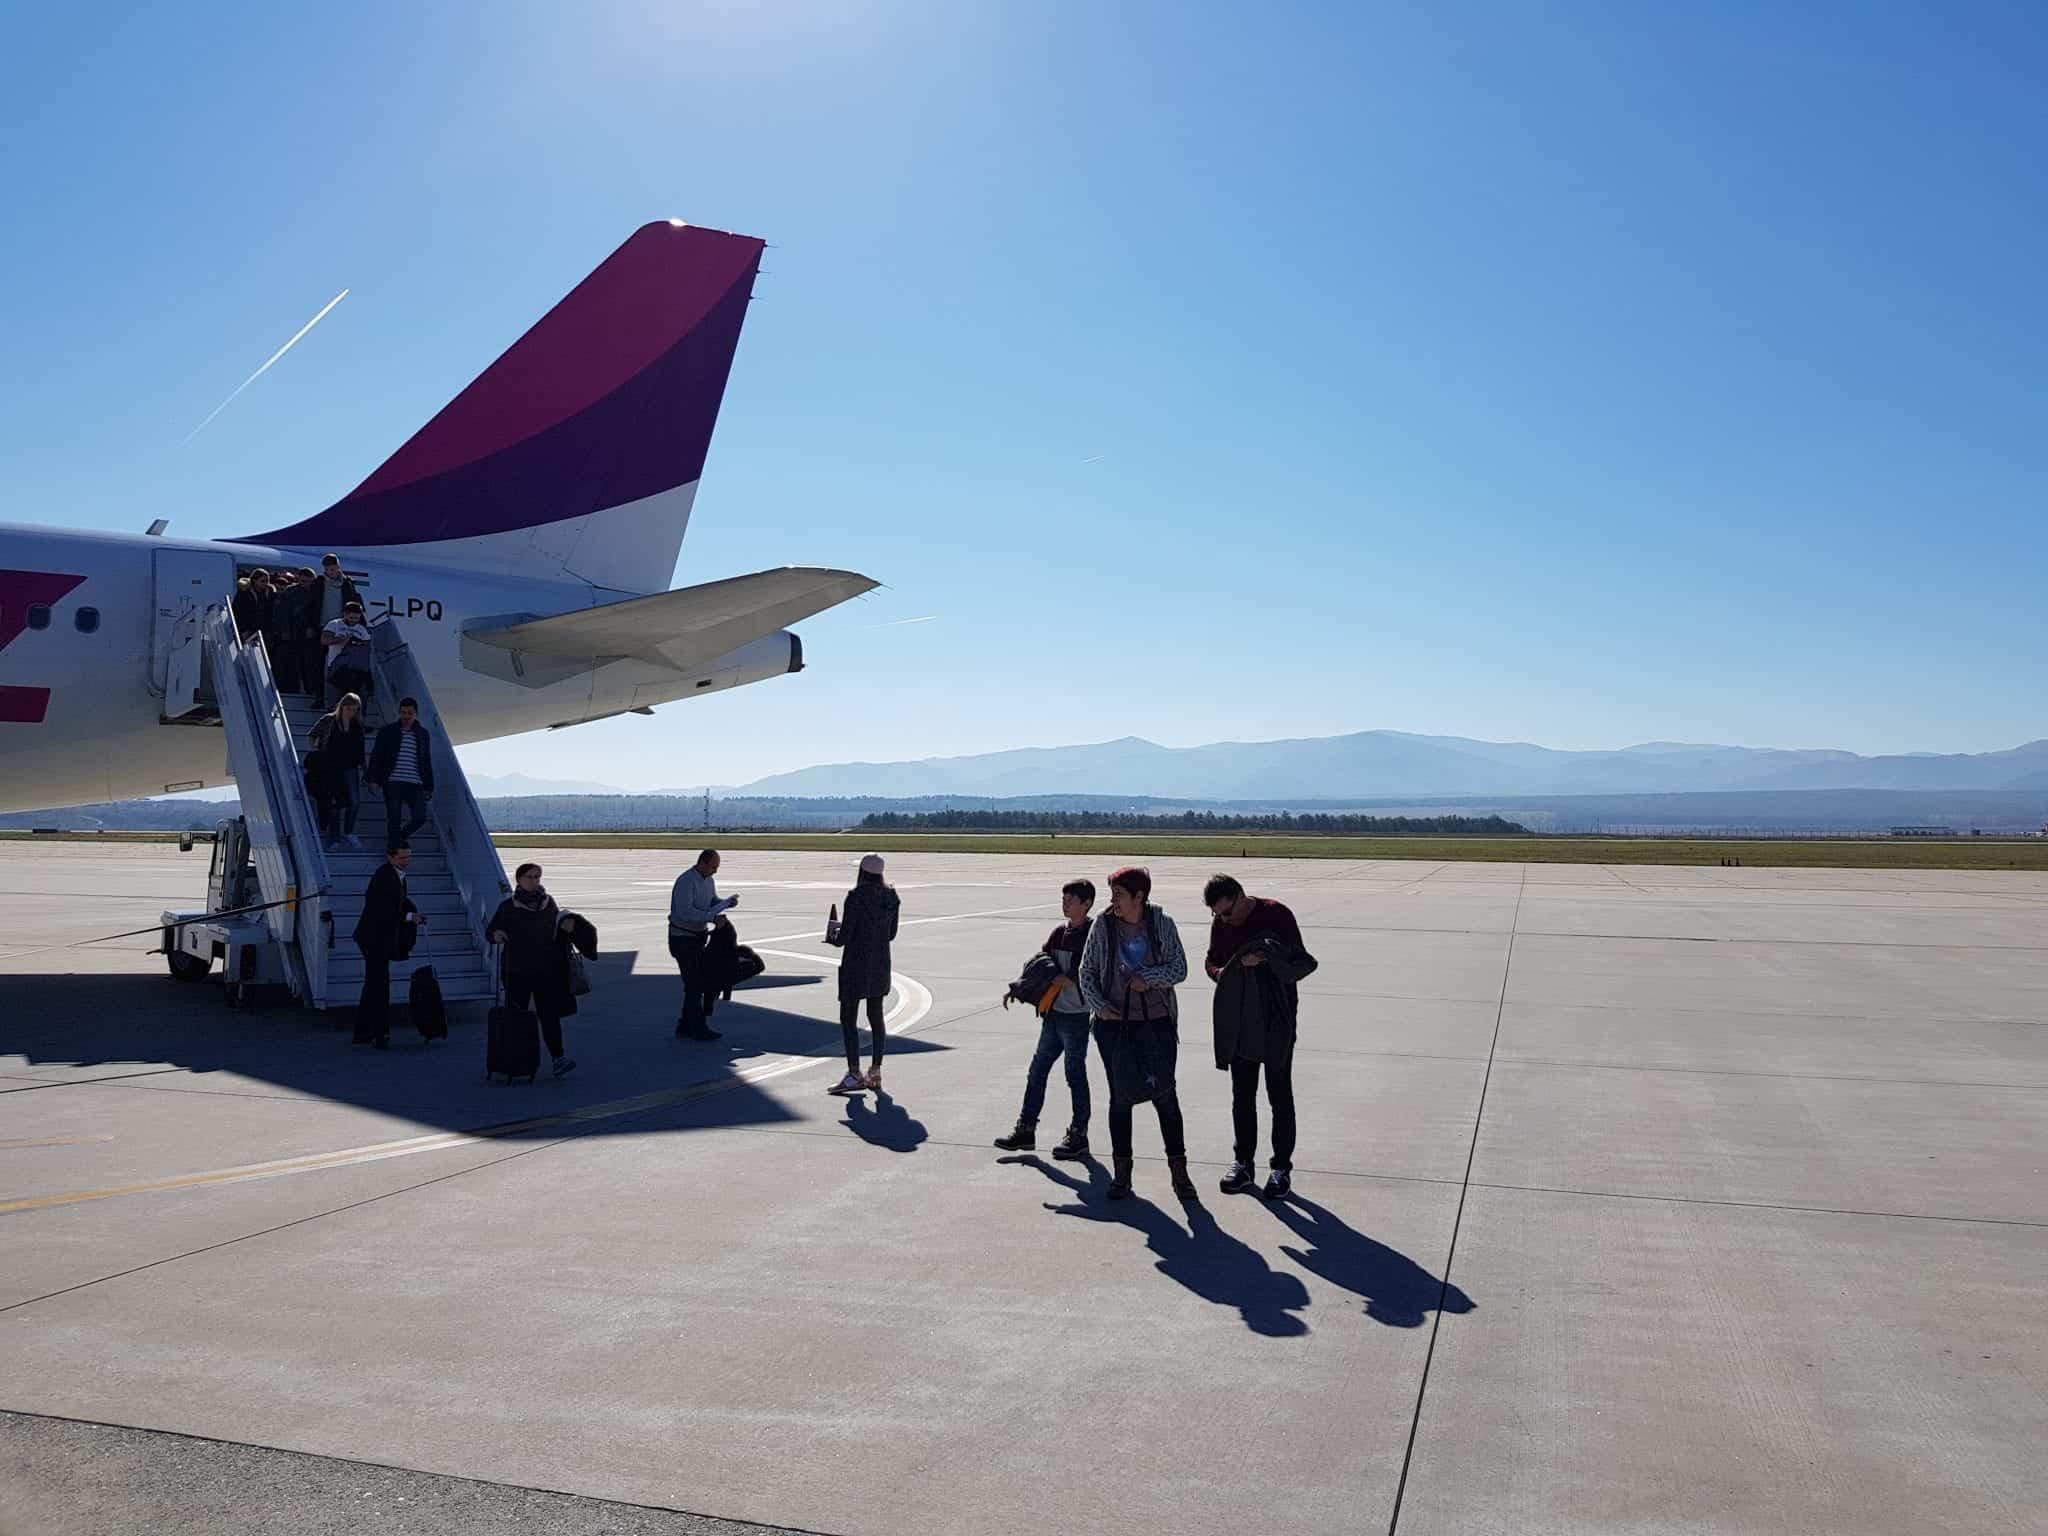 Flug nach Sibiu Airport DTM Dortmund Wizzair Wizz air Rumänien Romania